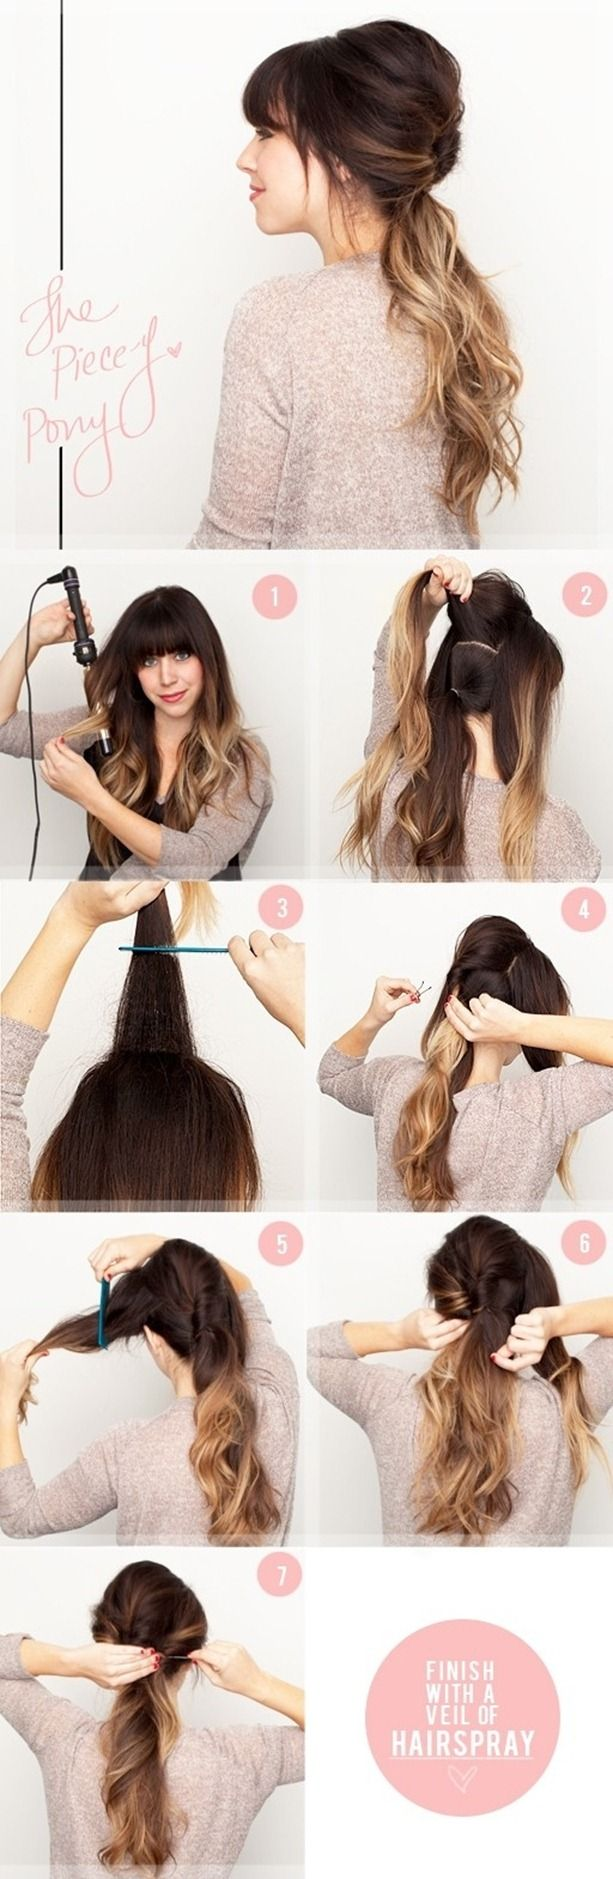 best hair images on pinterest braid hairstyles curl hair